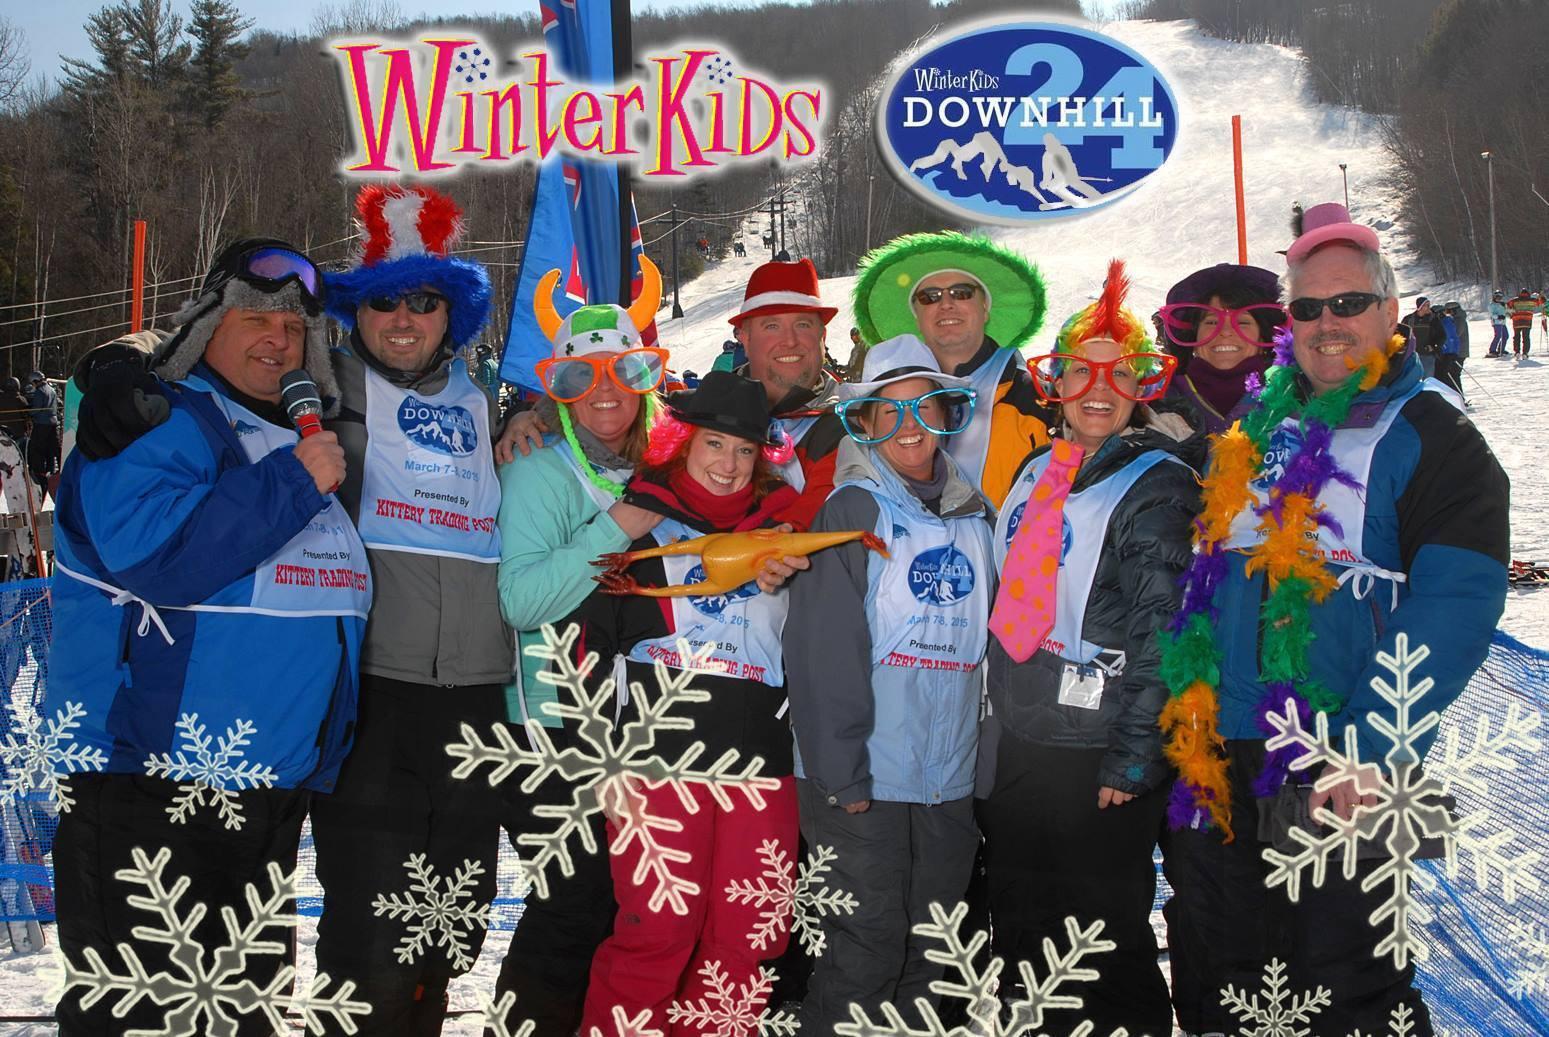 WinterKids Downhill24 2015 Photo Booth027